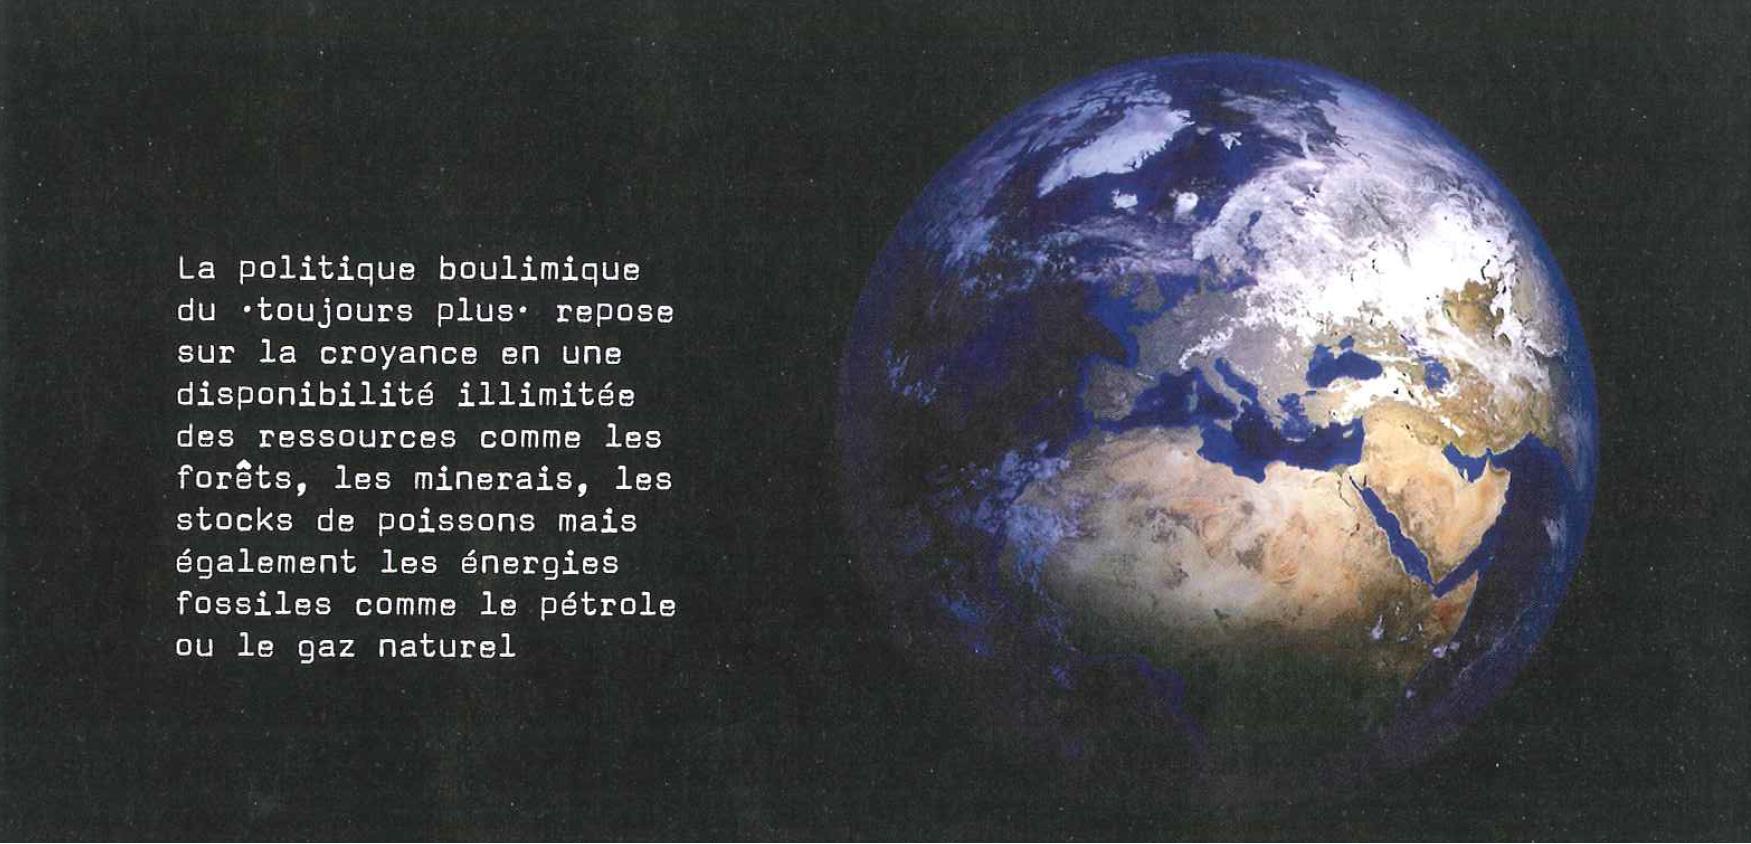 terre_plus_texte.png